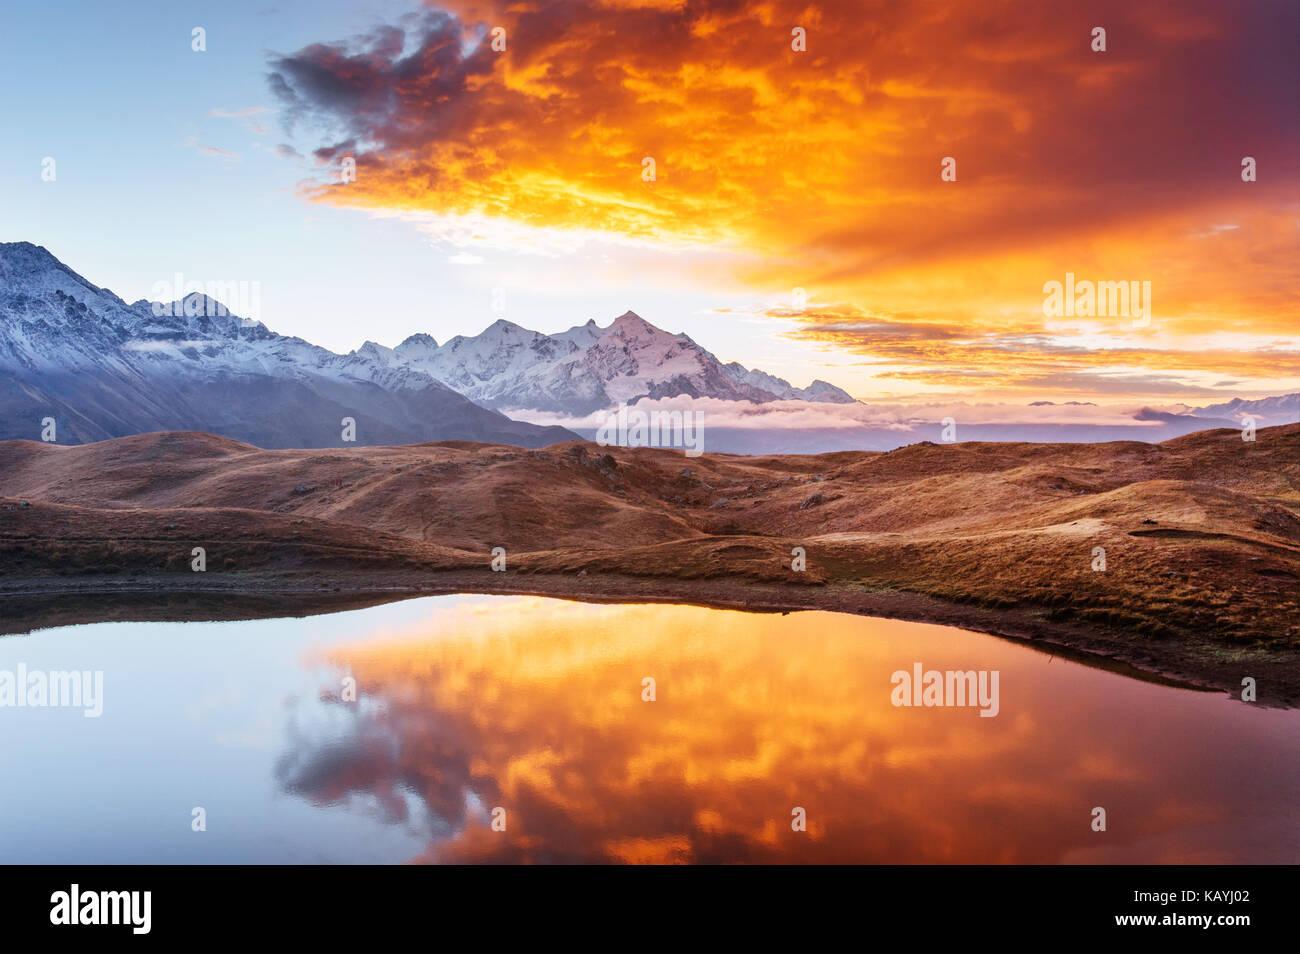 Lago de montaña. el precioso amanecer. mañana paisaje. koruldi lago. canto caucásico Principal Imagen De Stock